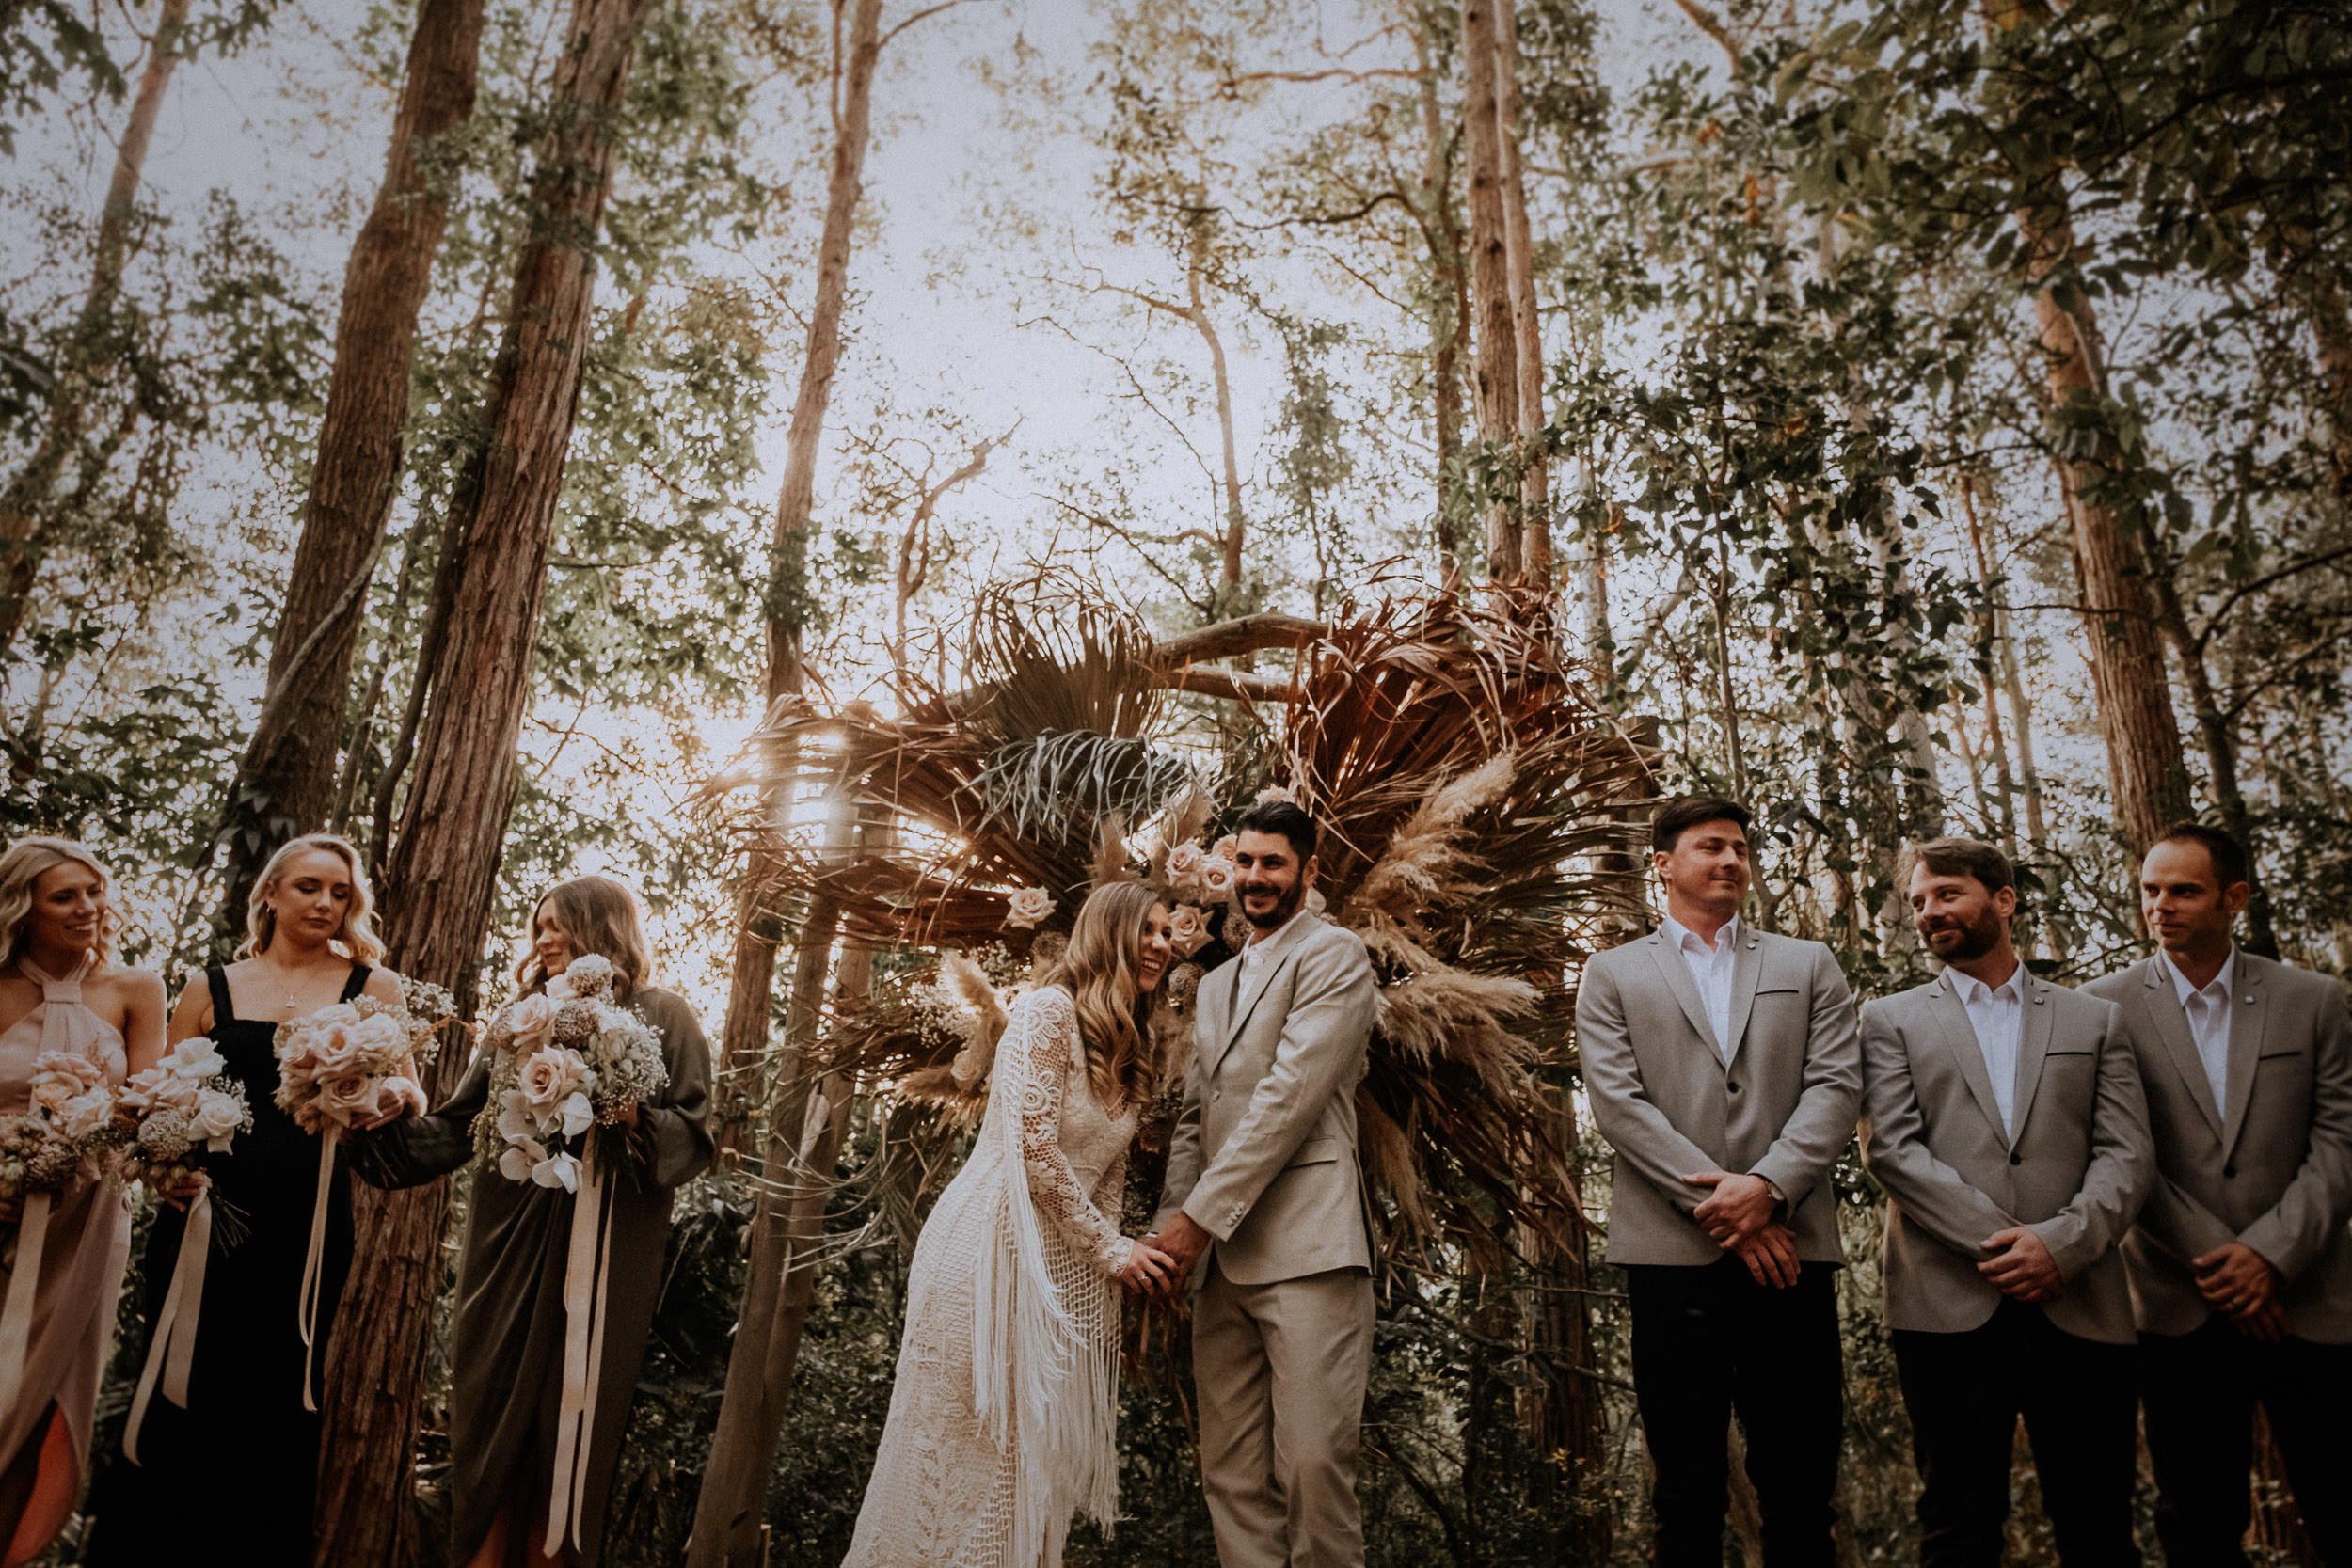 S&A Elopement - Kings & Thieves - Shred 'Til Dead - Central Coast Beach Forest Wedding - 229.jpg